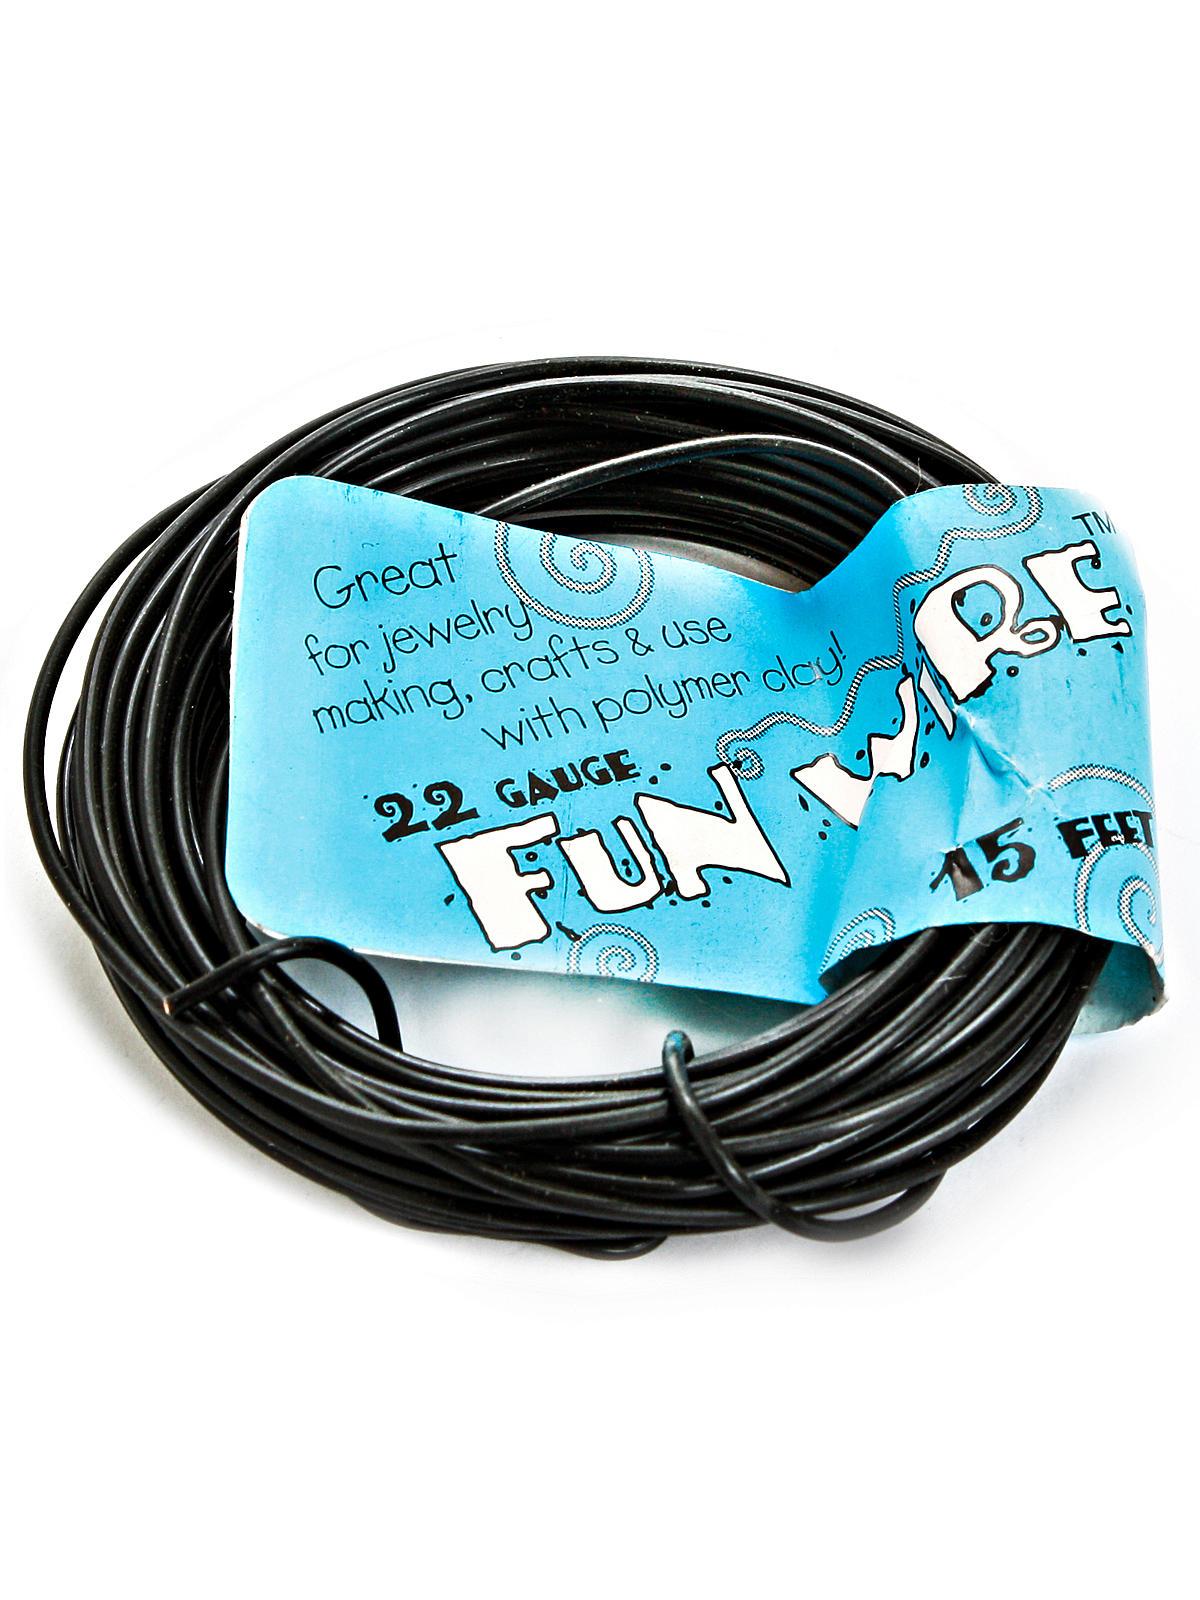 Toner Crafts Fun Wire | MisterArt.com